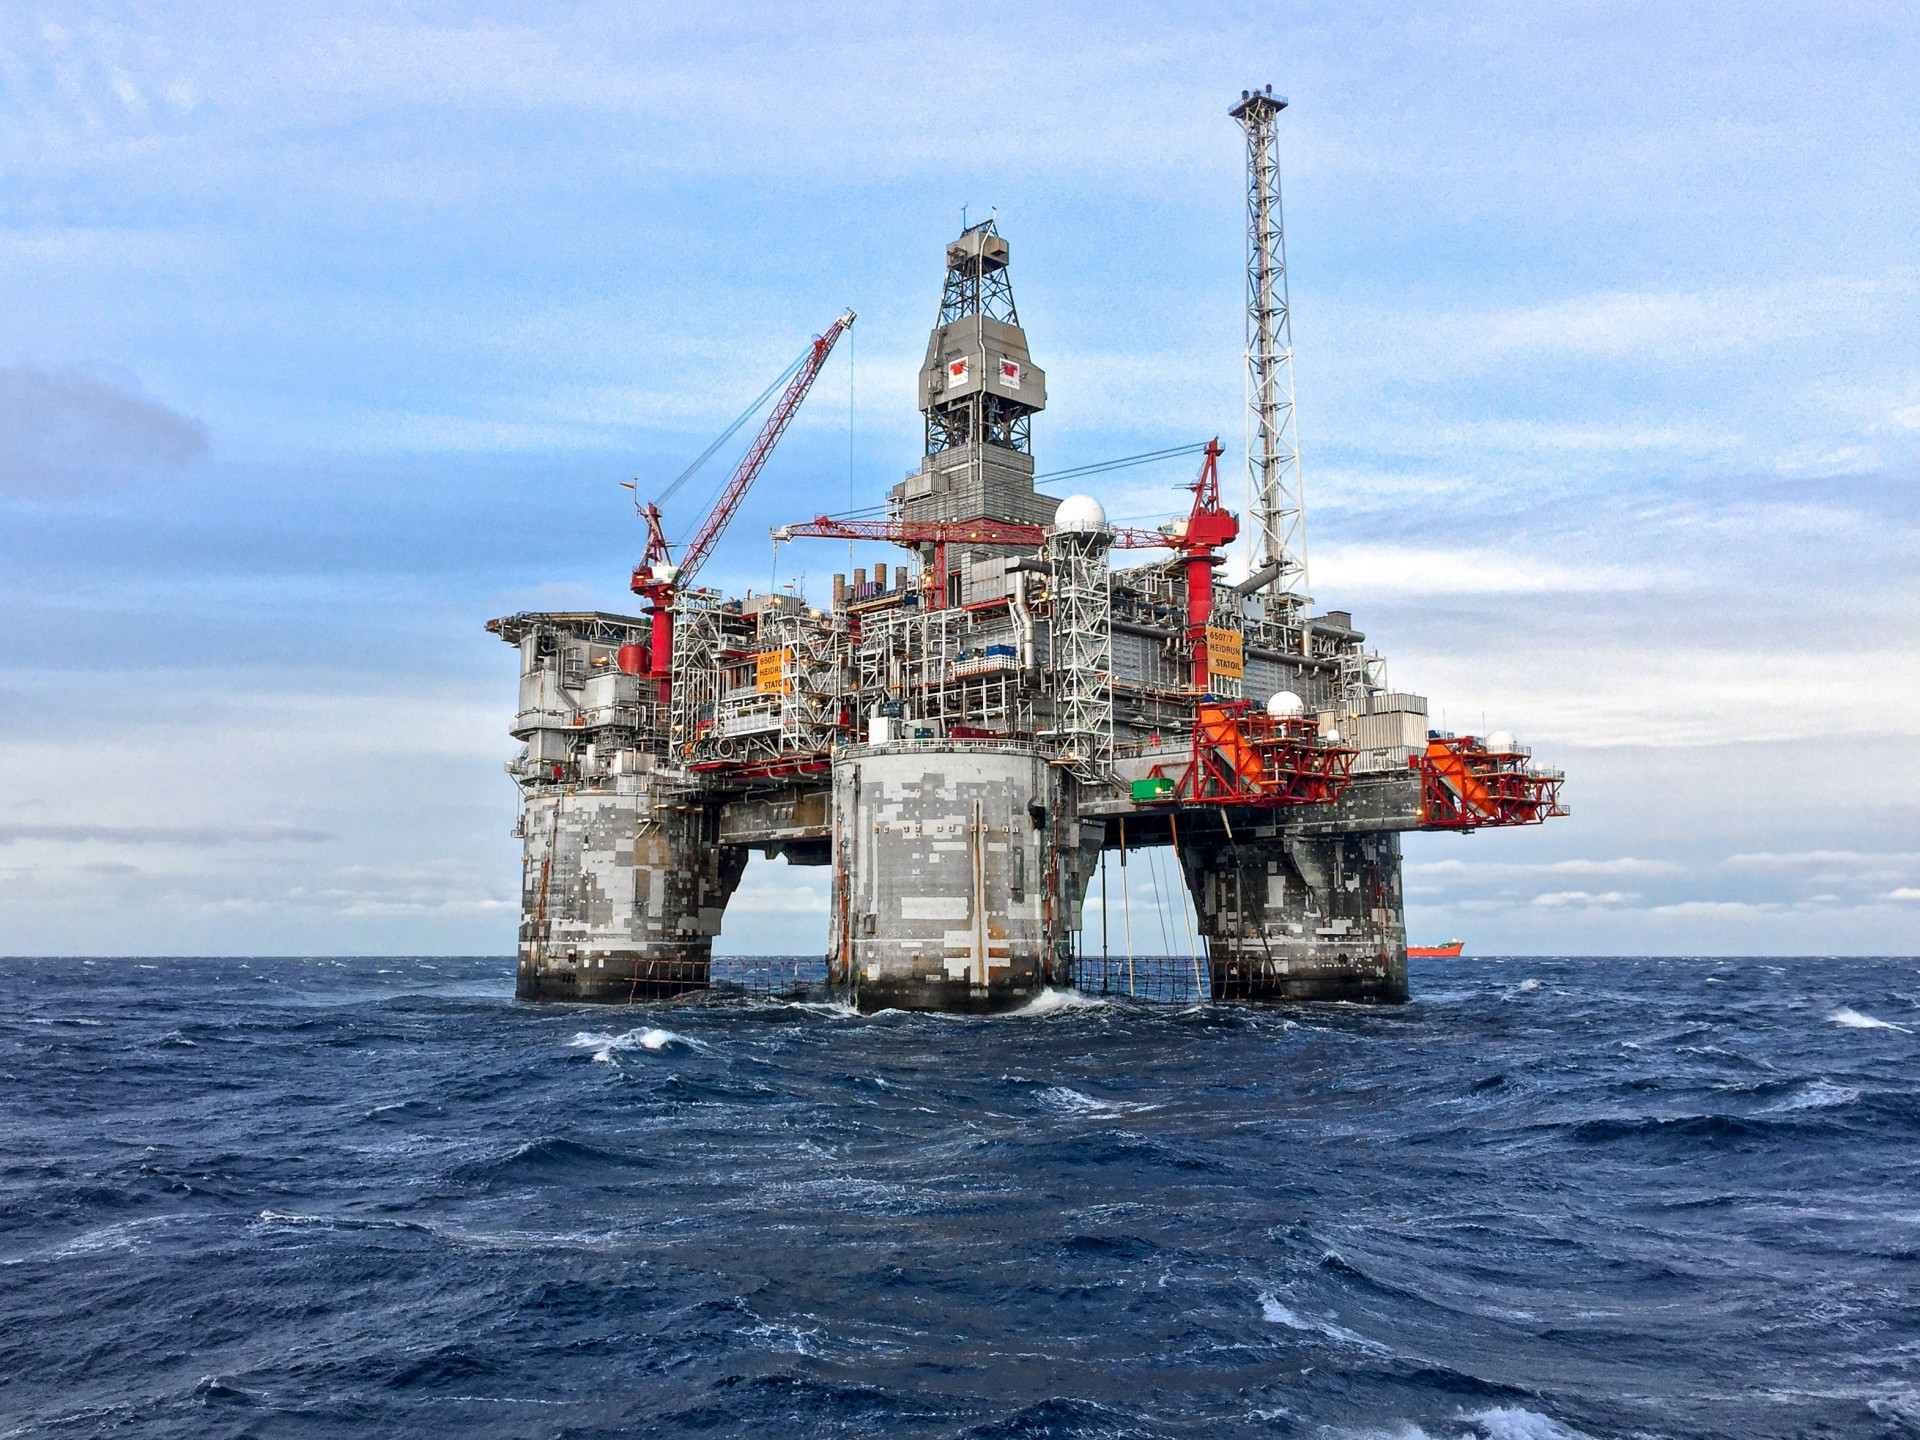 Finansdepartements ekspertutvalg foreslår nullutslippsmål for Oljefondet